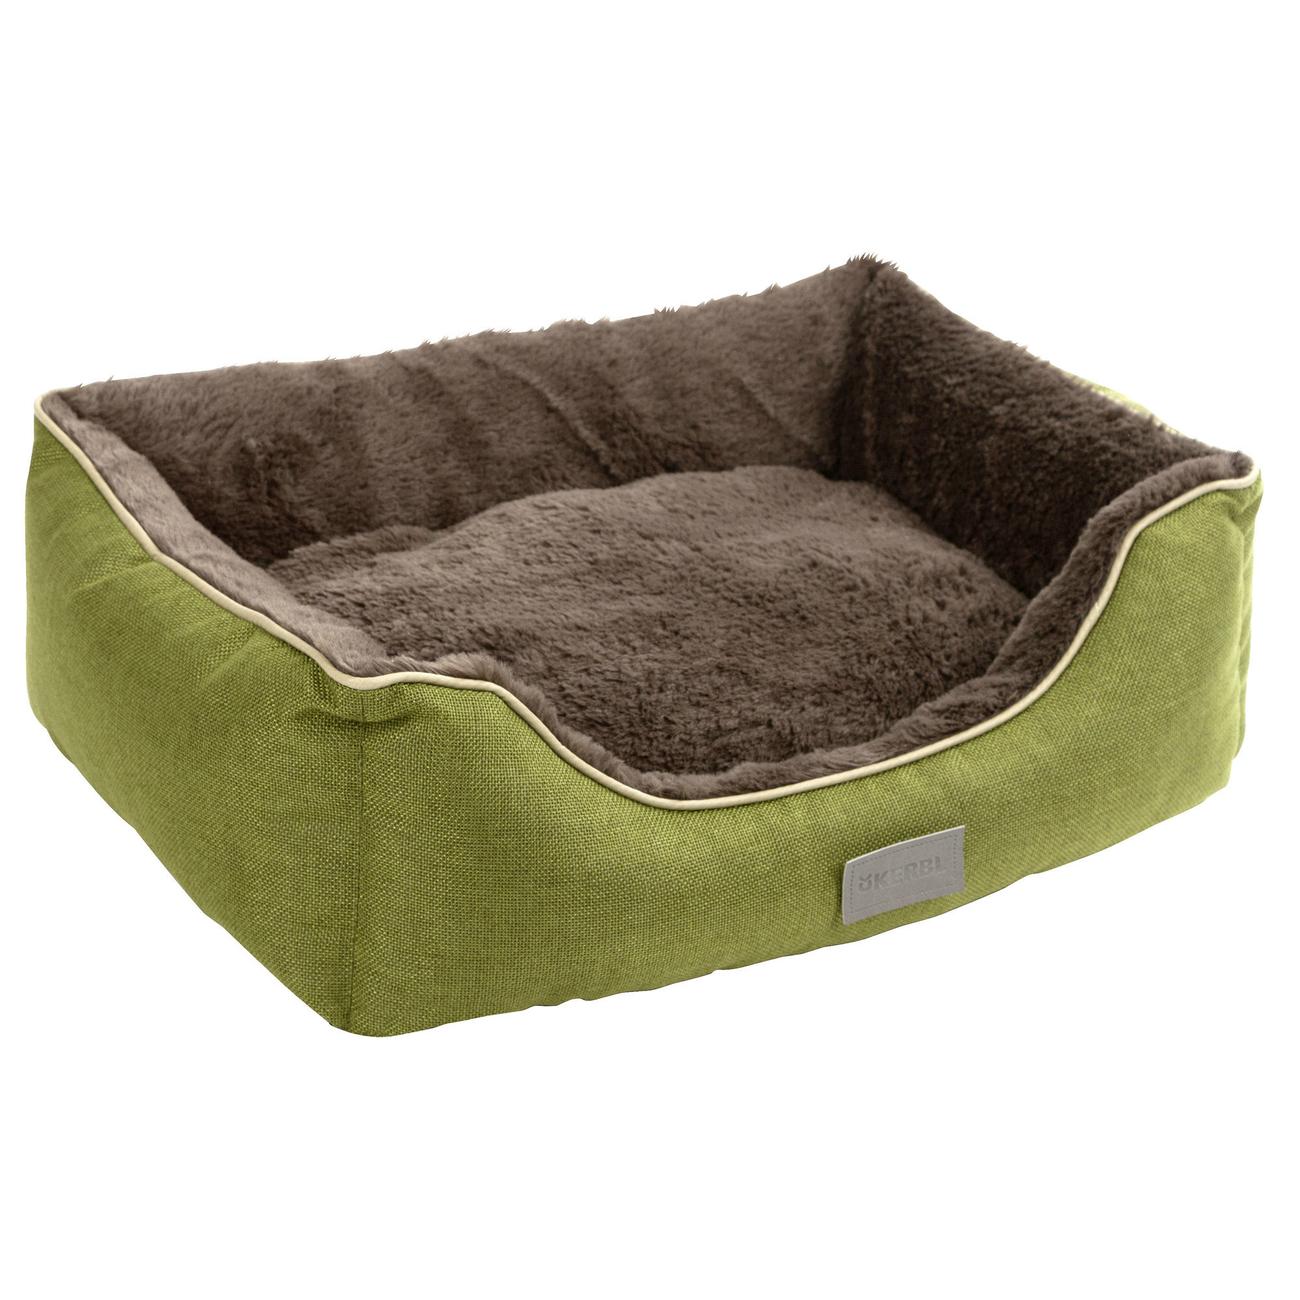 Kerbl Hundebett Katzenbett Samuel, Bild 6